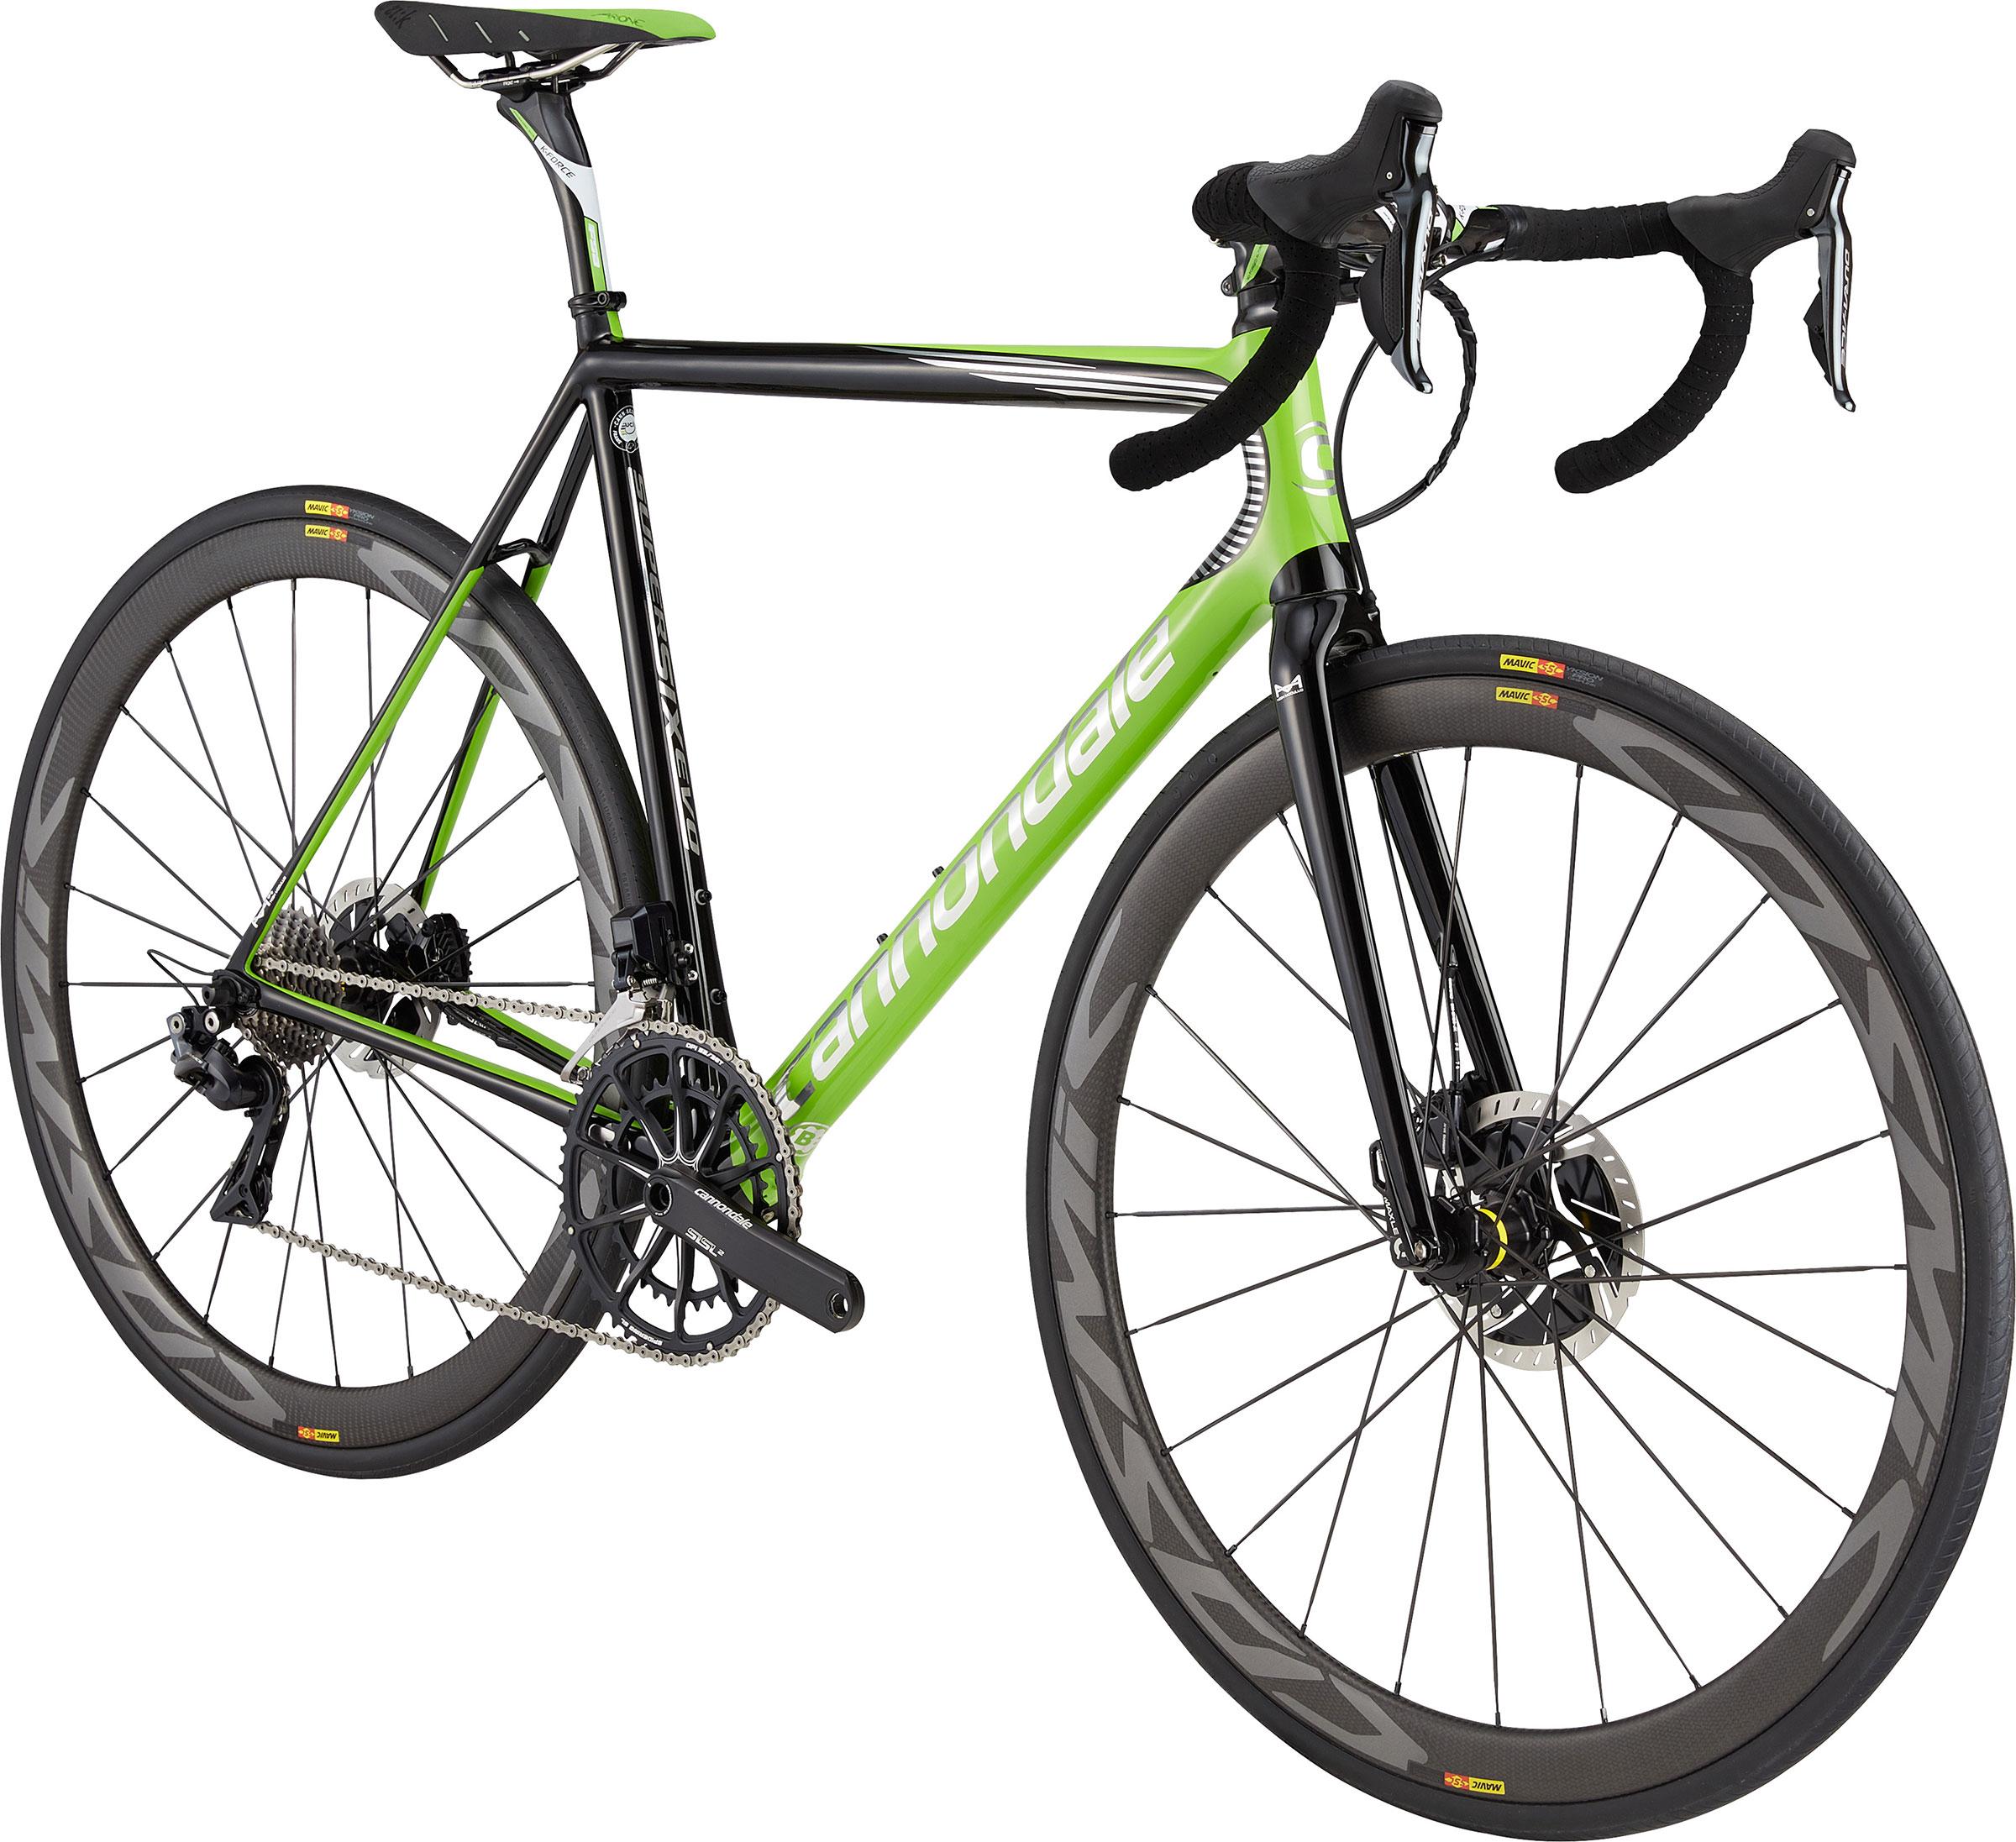 870a26d8395 Cannondale SuperSix EVO Hi-MOD Disc Team - City Bikes